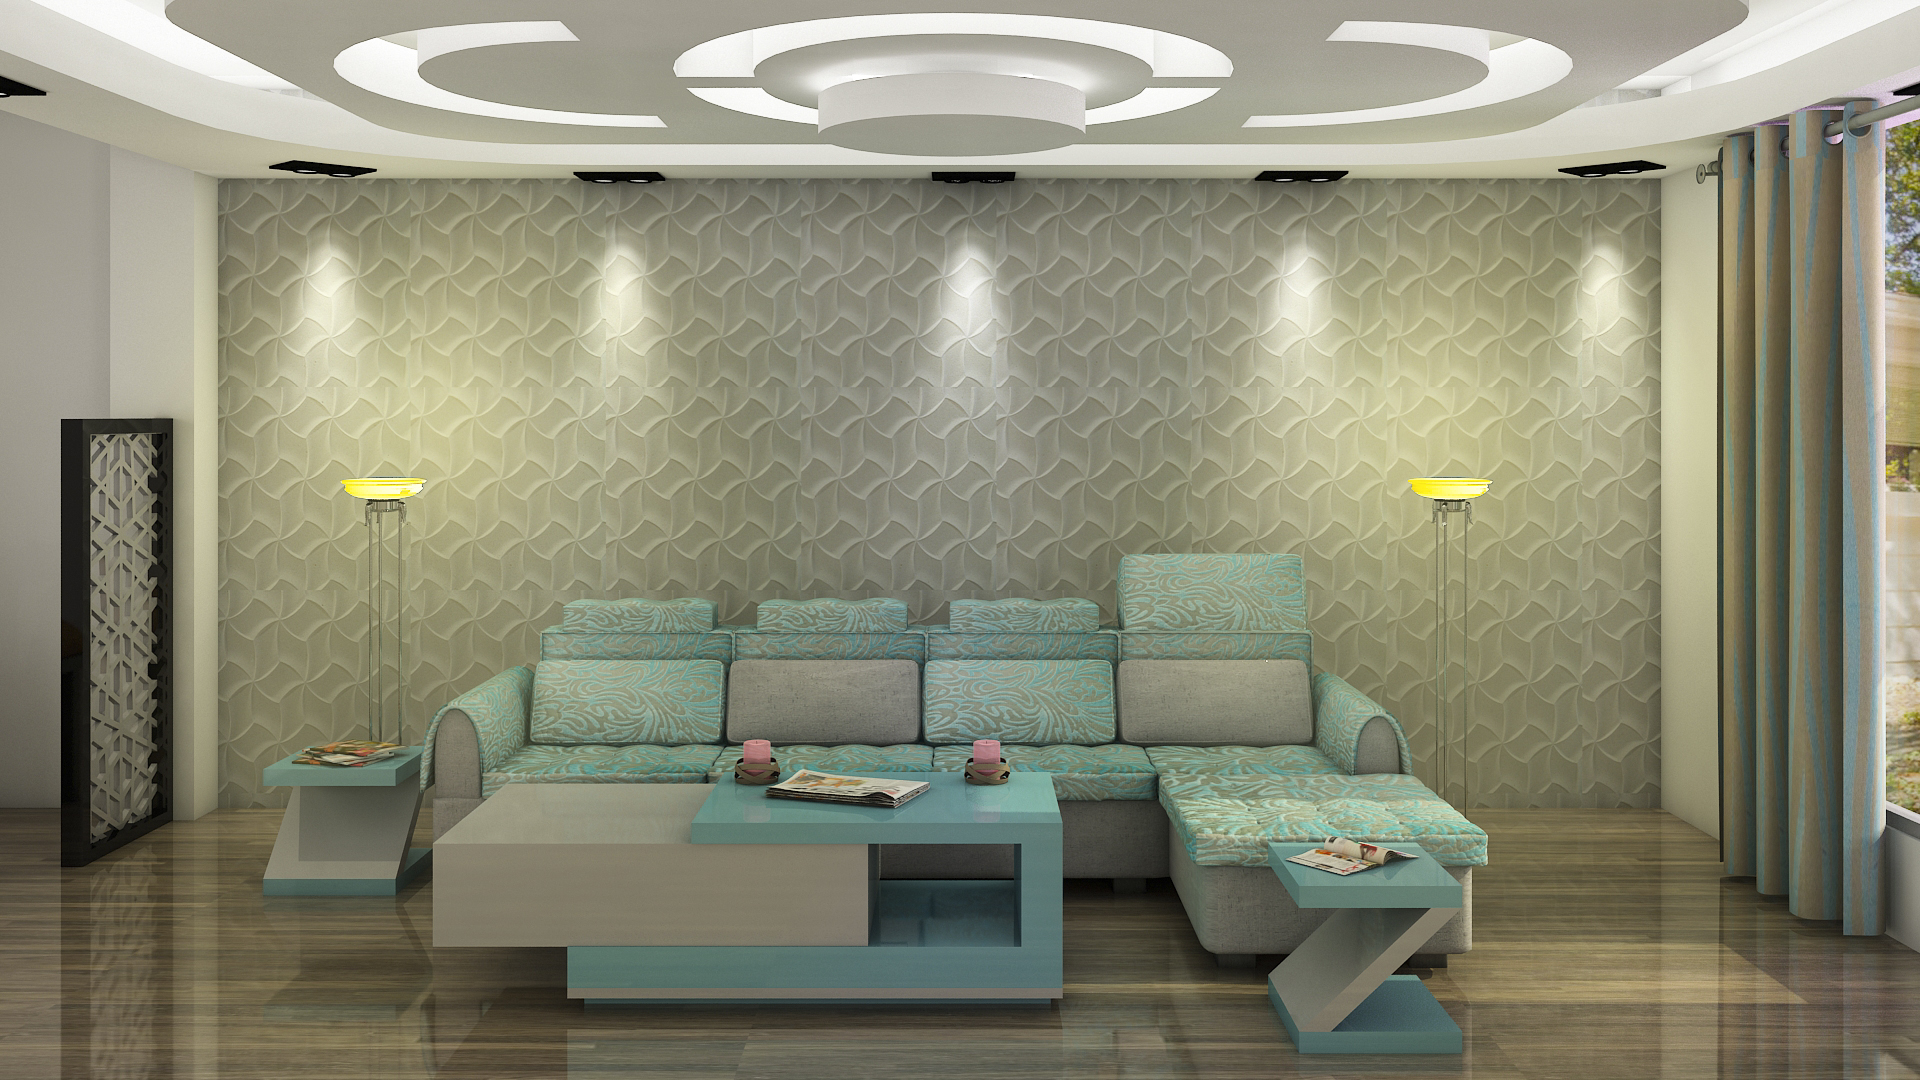 greenish texture Wall Painting ideas